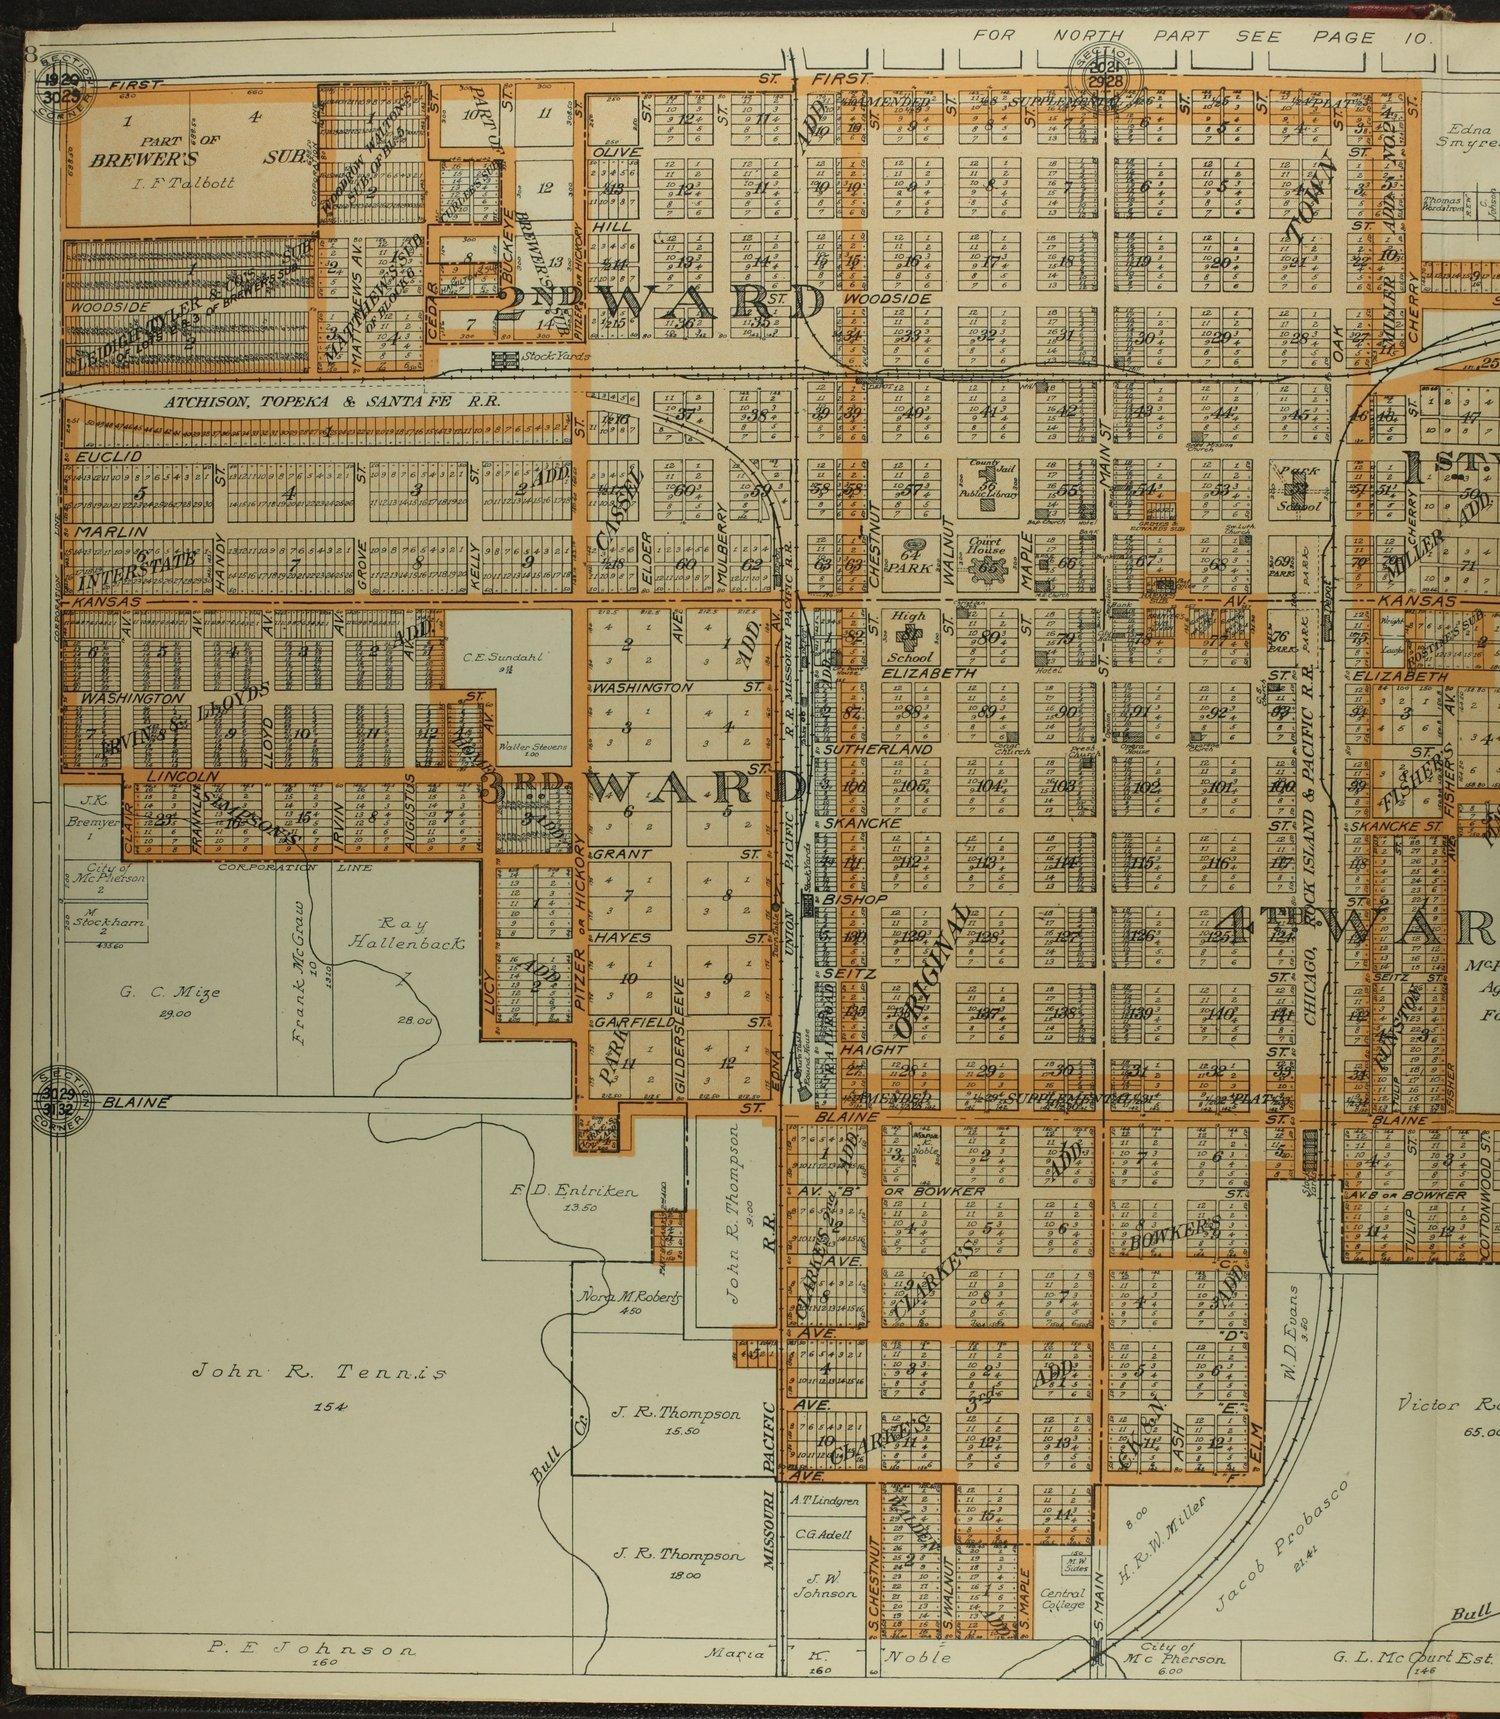 Standard atlas of McPherson County, Kansas - 8